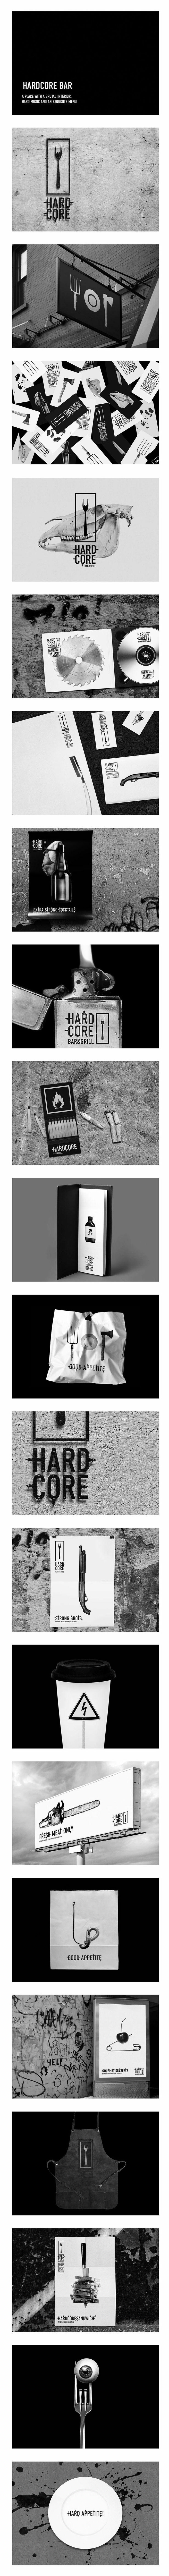 Hardcore bar #identity #packaging #branding PD: